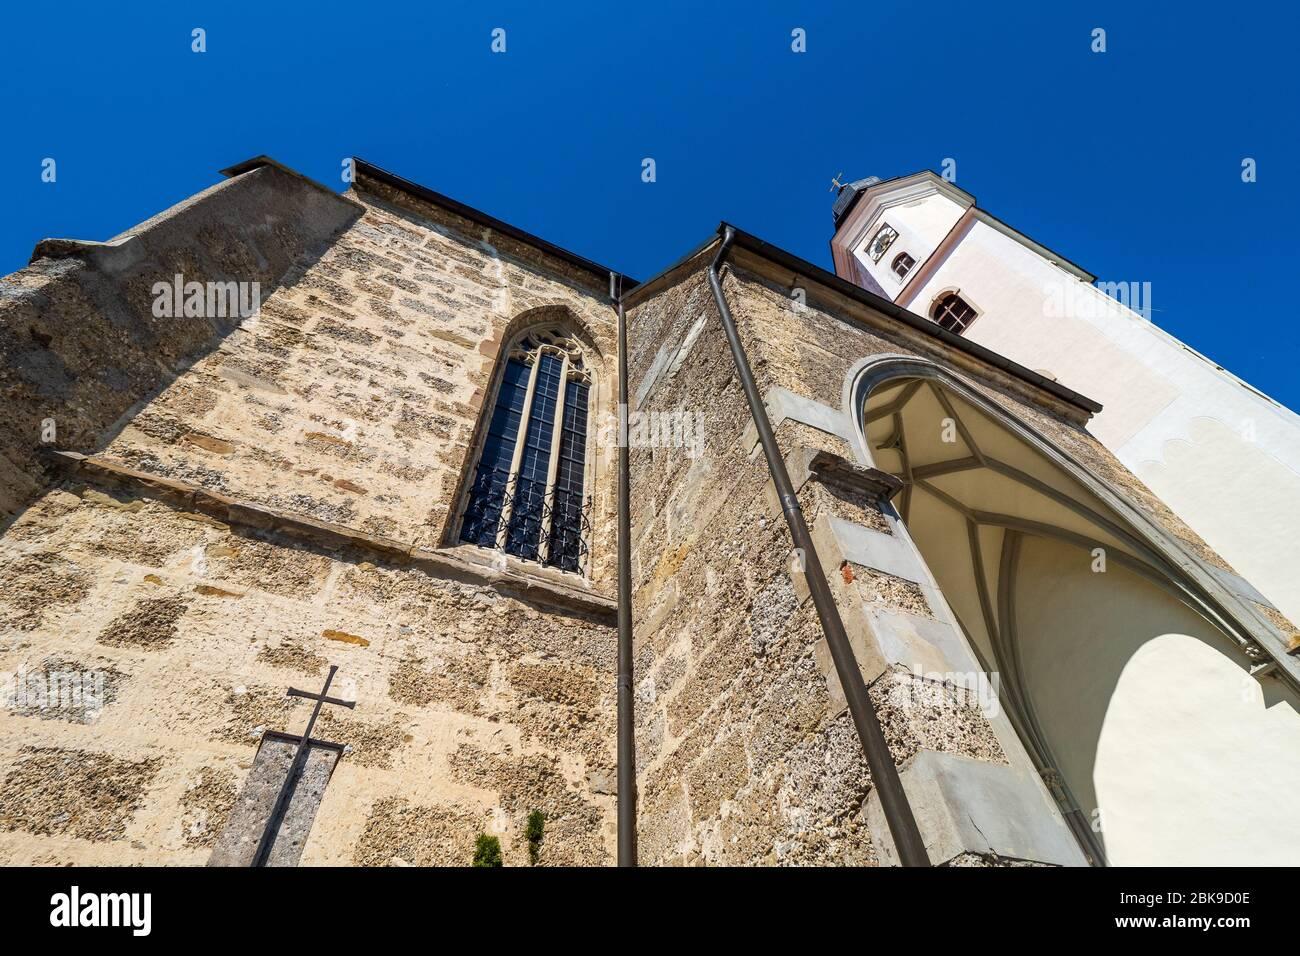 Vista exterior de la iglesia del siglo XV del salón católico Wallfahrtskirche Mariä Heimsuchung en Zell am Pettenfirst, Oberösterreich, Austria Foto de stock